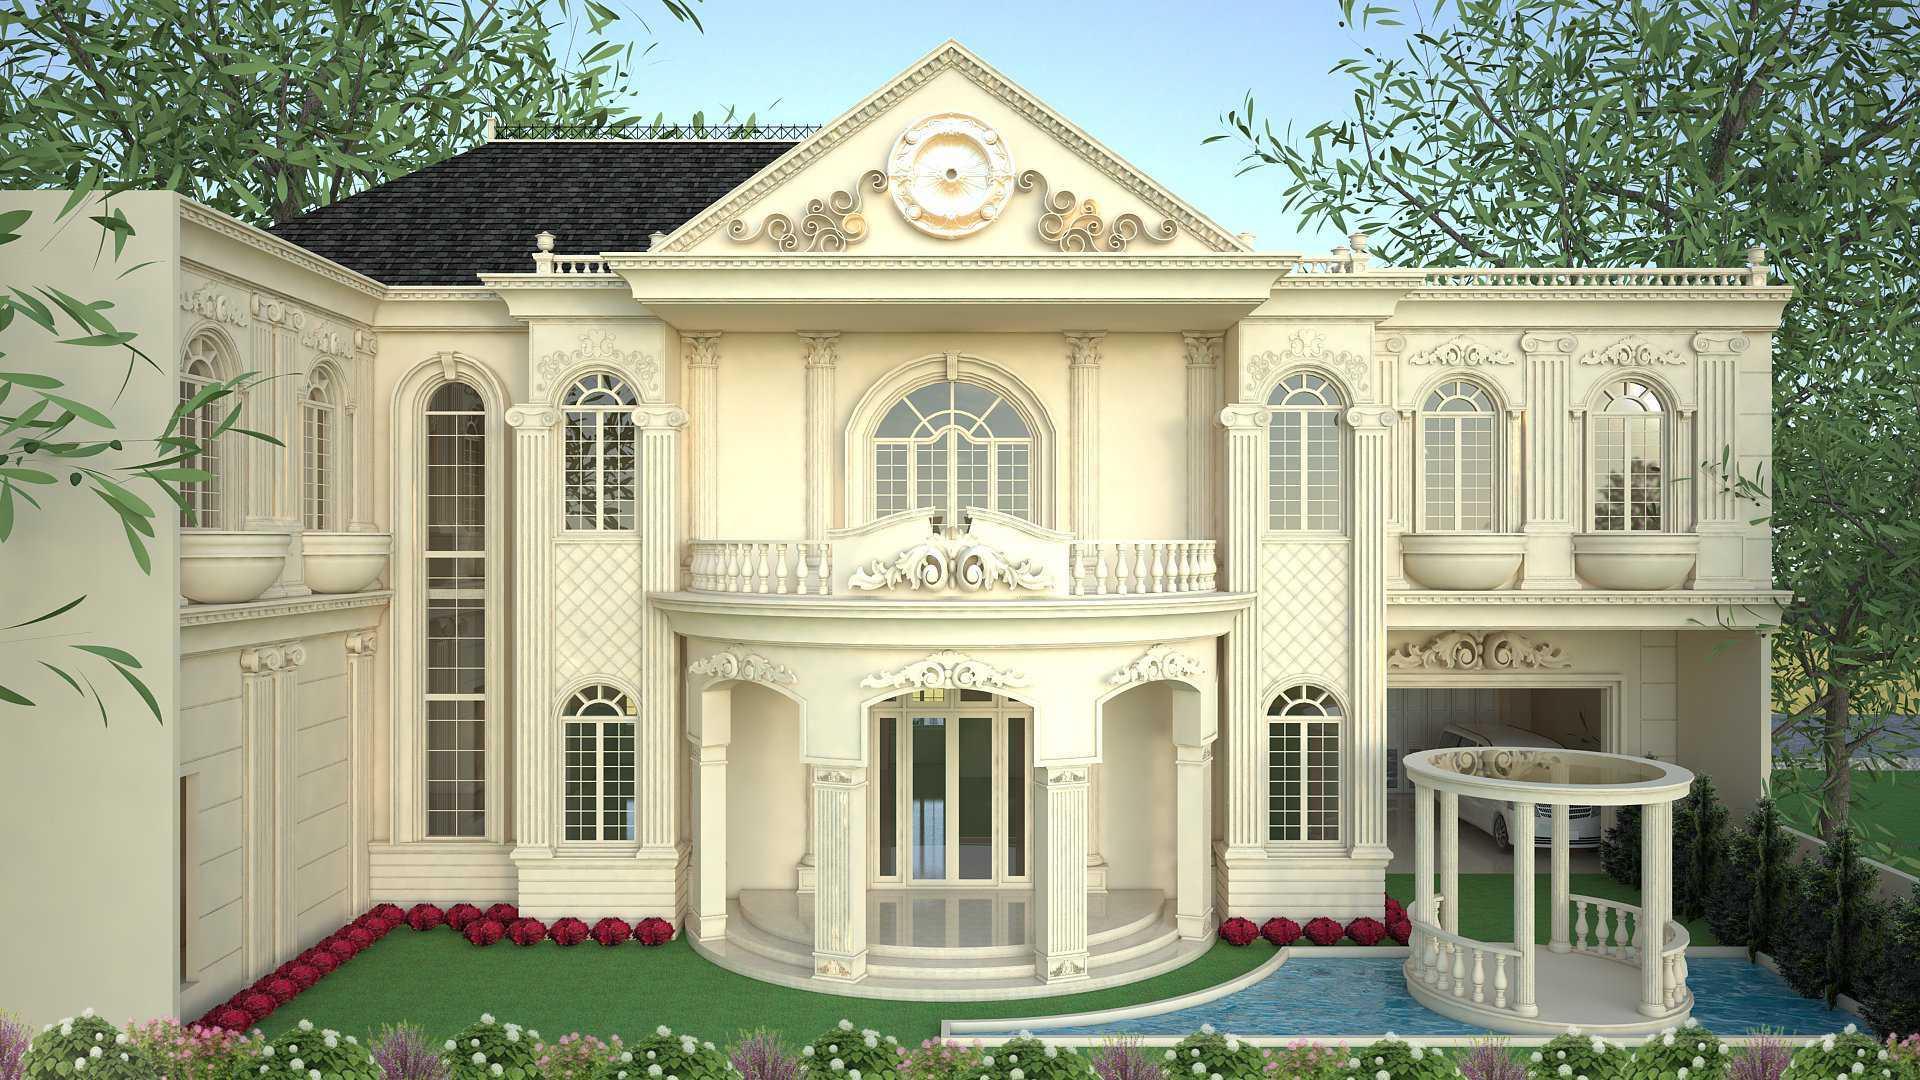 Arsindo Cipta Karya Classic House Project Cimahi Bandung Bandung Bandung 7-Copy Klasik  26832